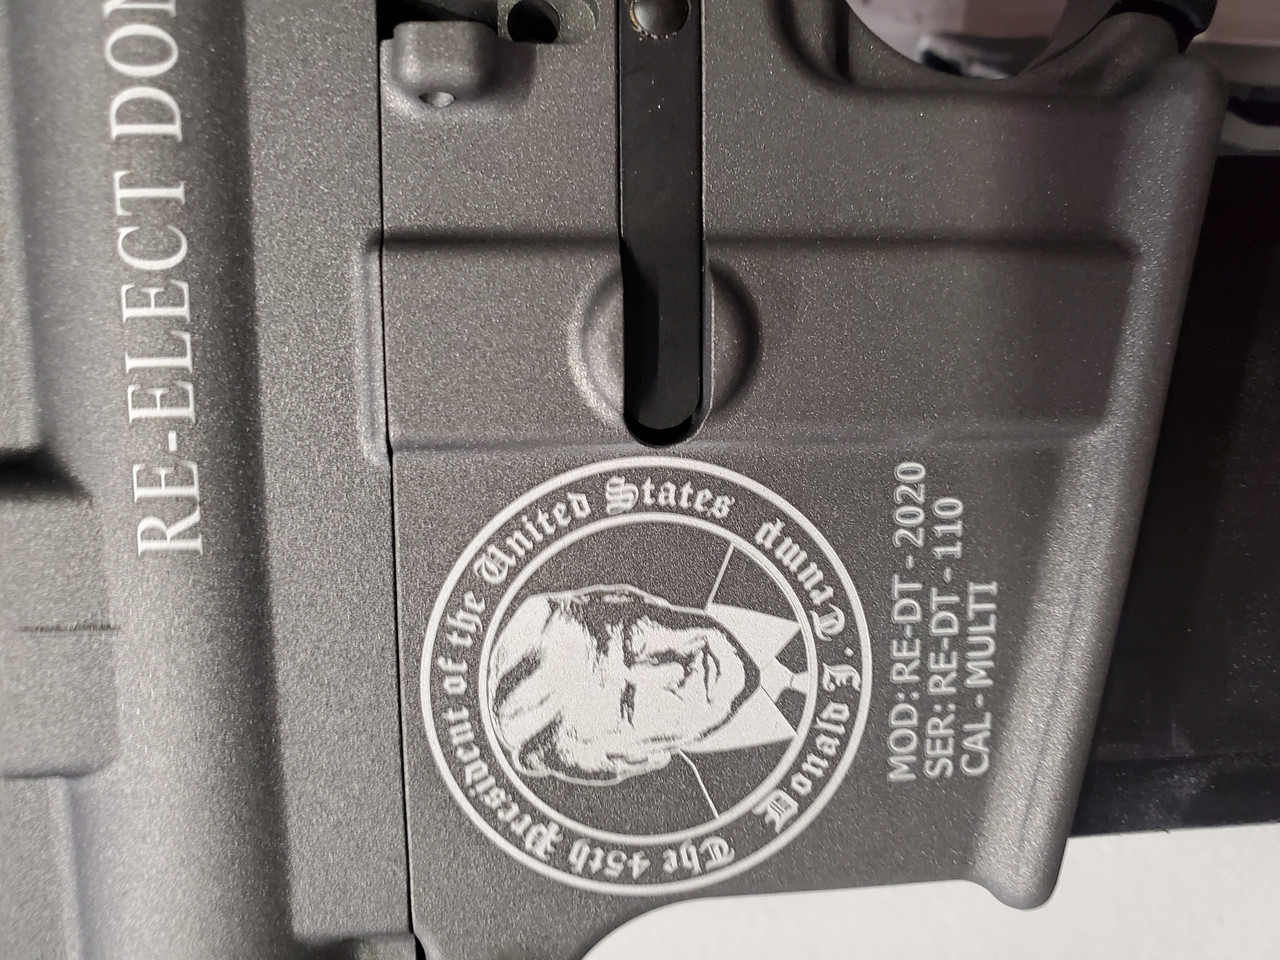 Custom Engraved Themed Firearms